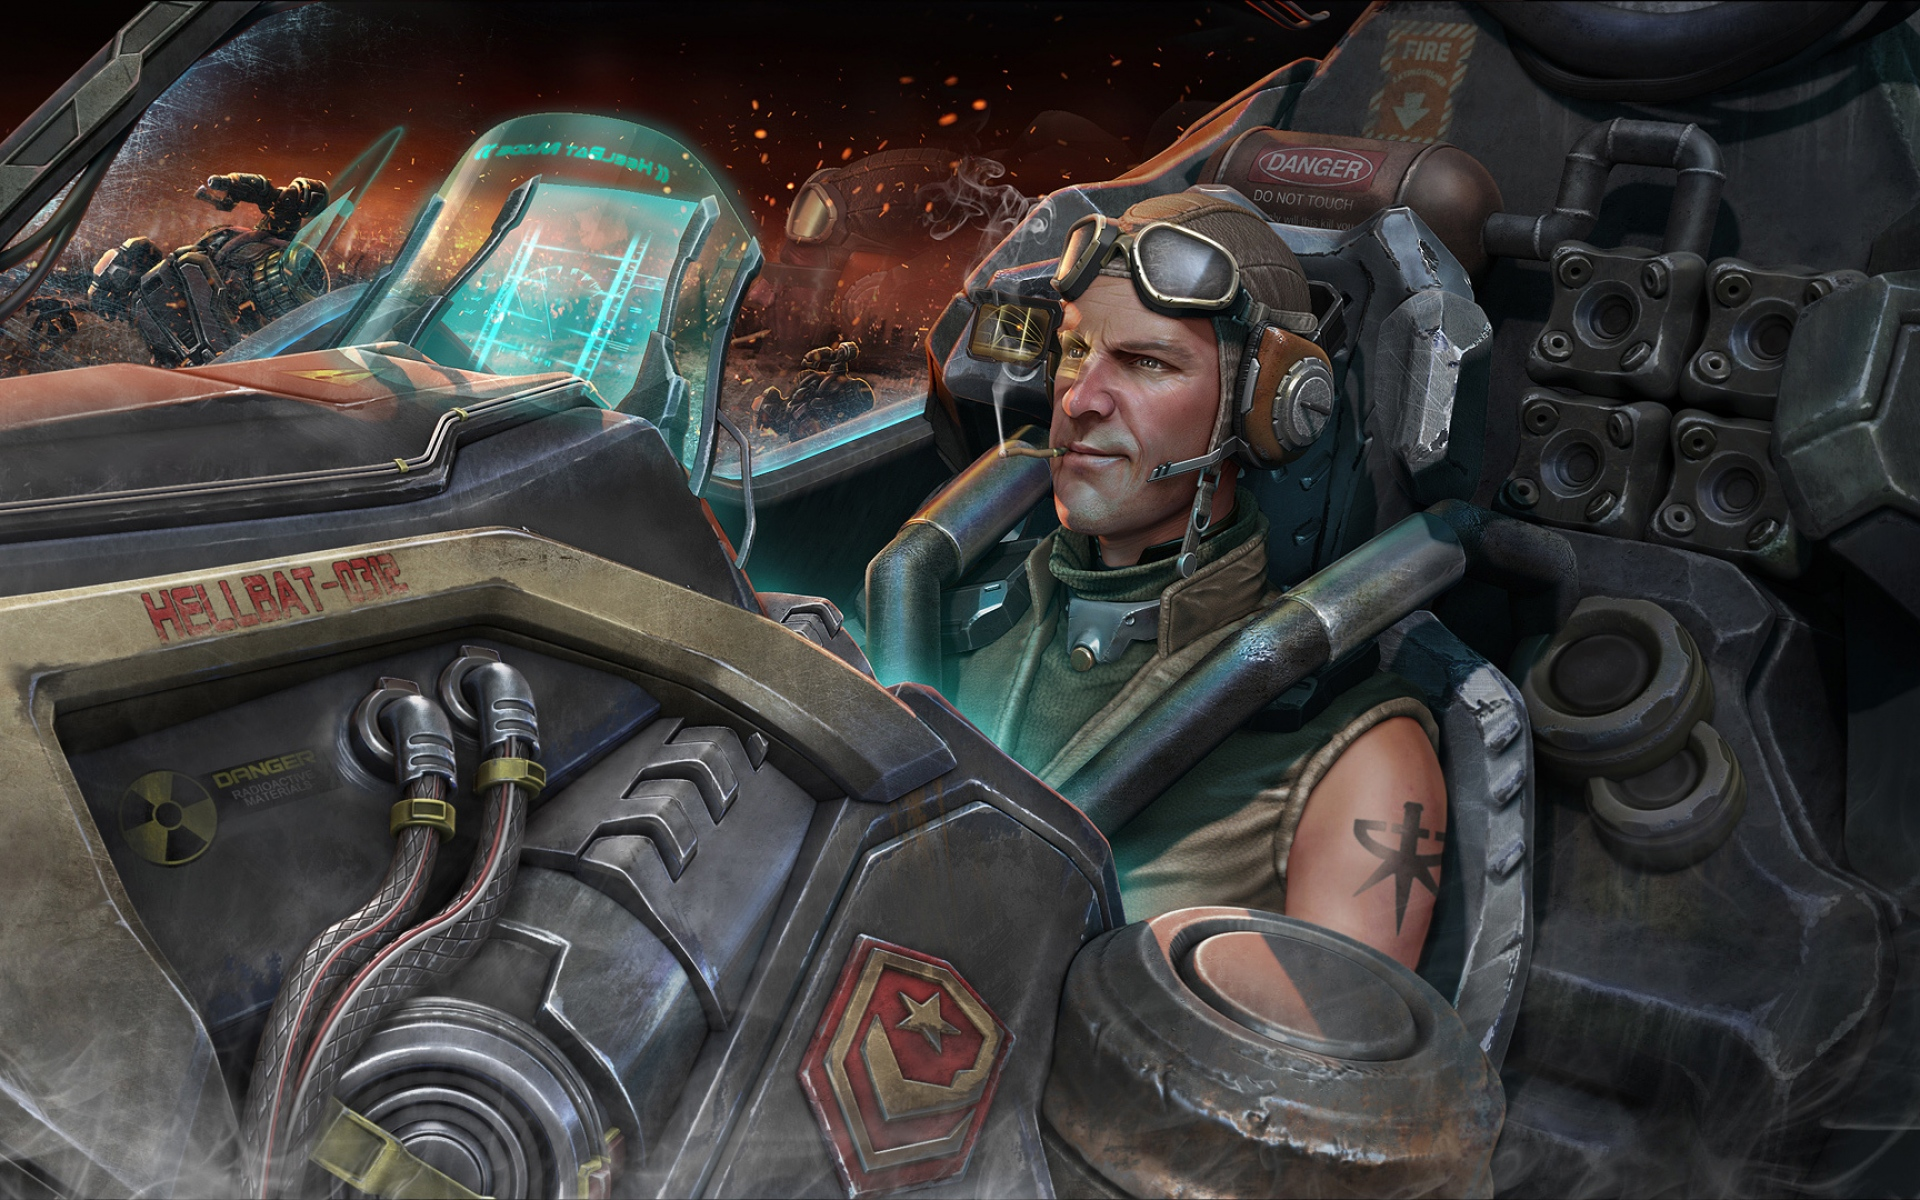 Картинки StarCraft II, StarCraft 2, мужчина, шлем, кабина, корабль фото и обои на рабочий стол